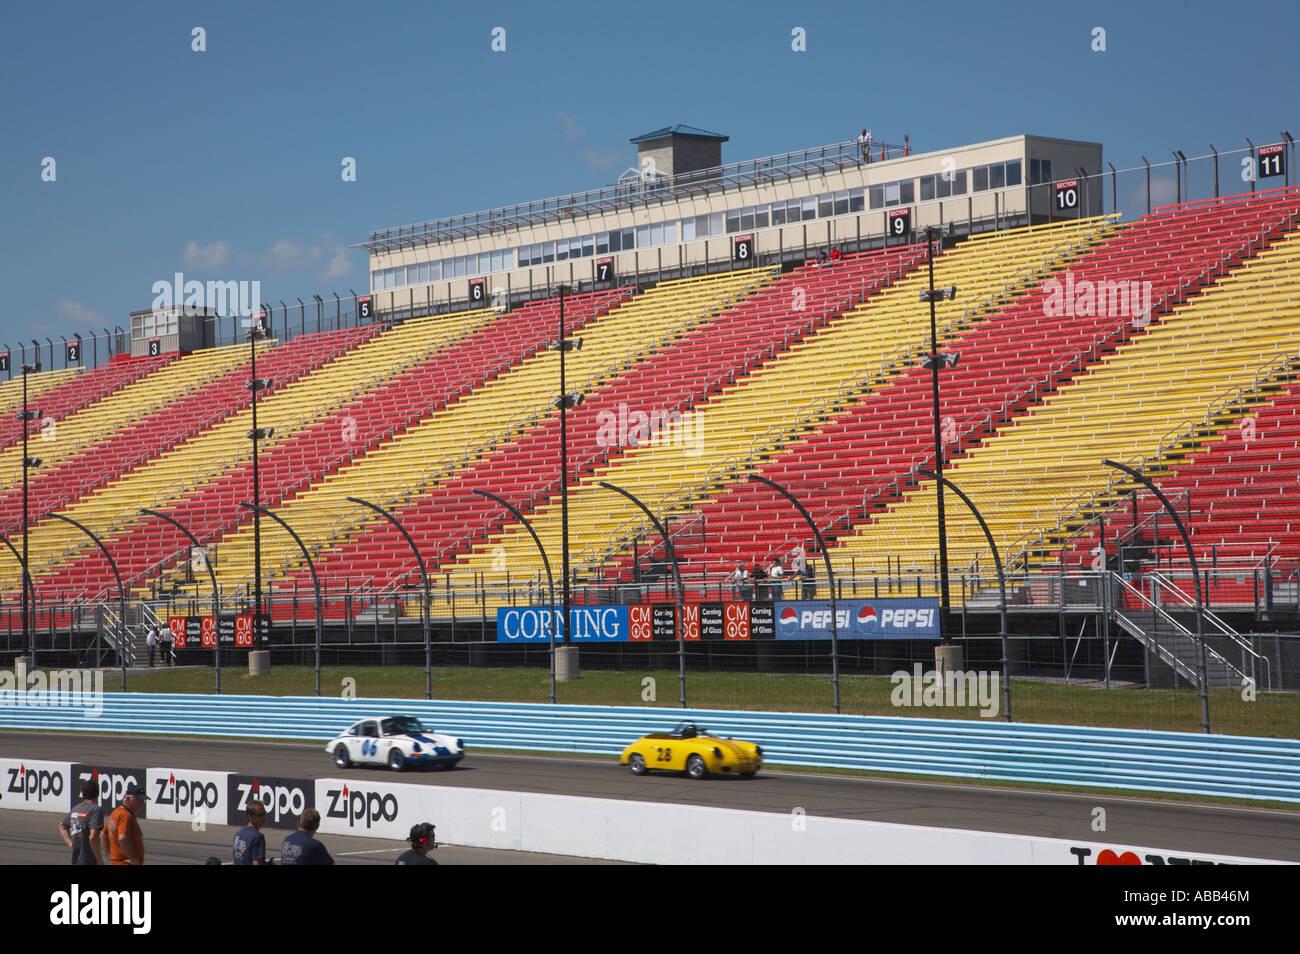 Empty grandstands at Watkins Glen International Raceway in Watkins